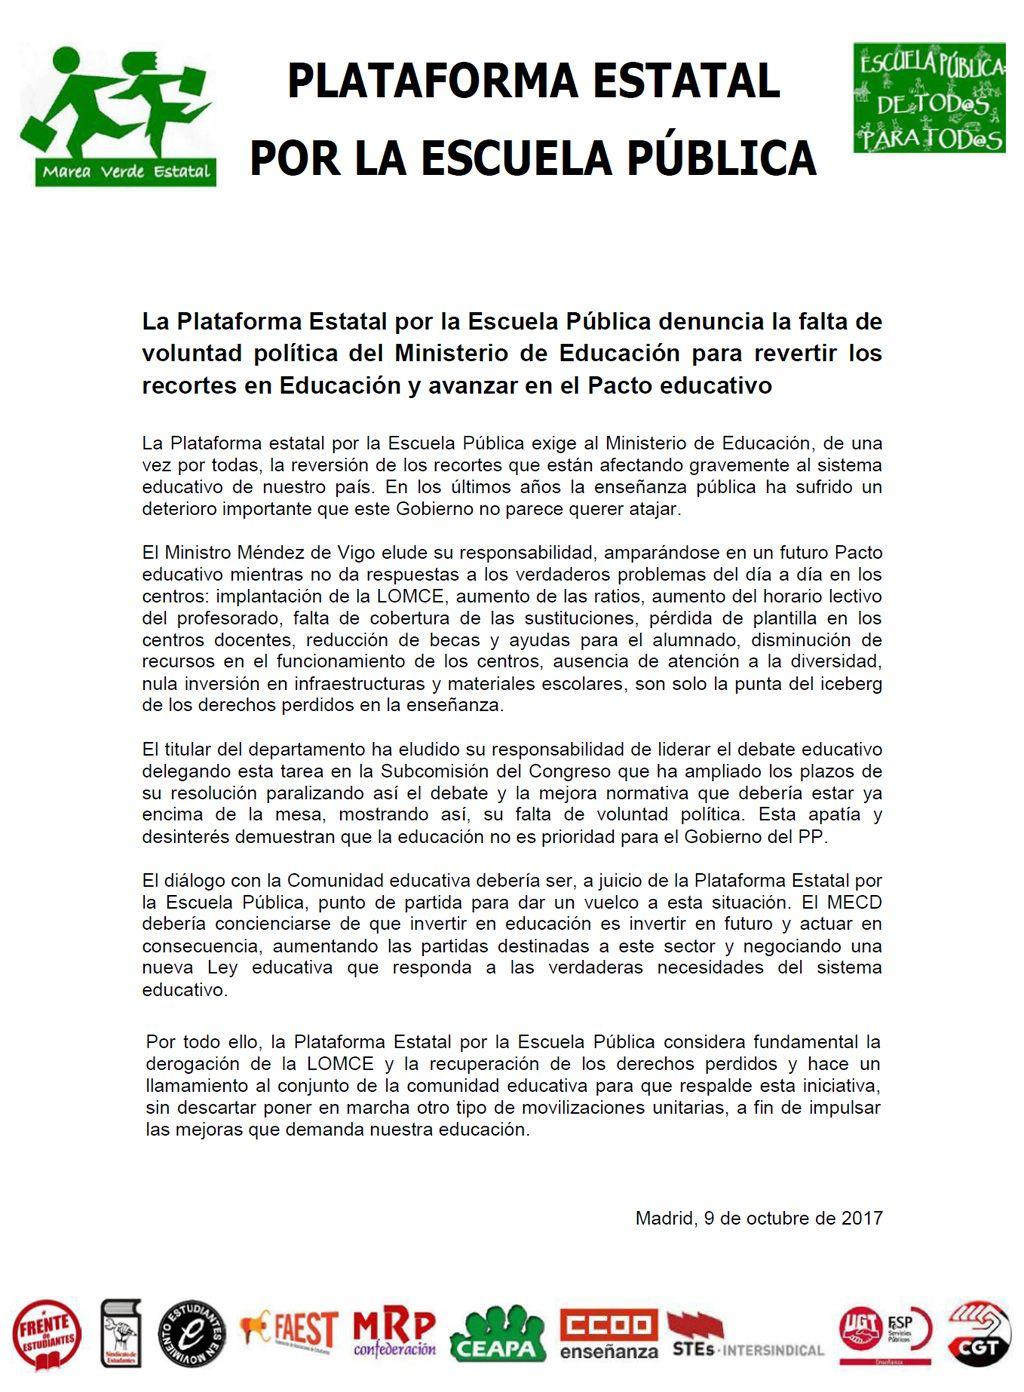 17-10-09-Comunicado-Plataforma-Escuela-Publica